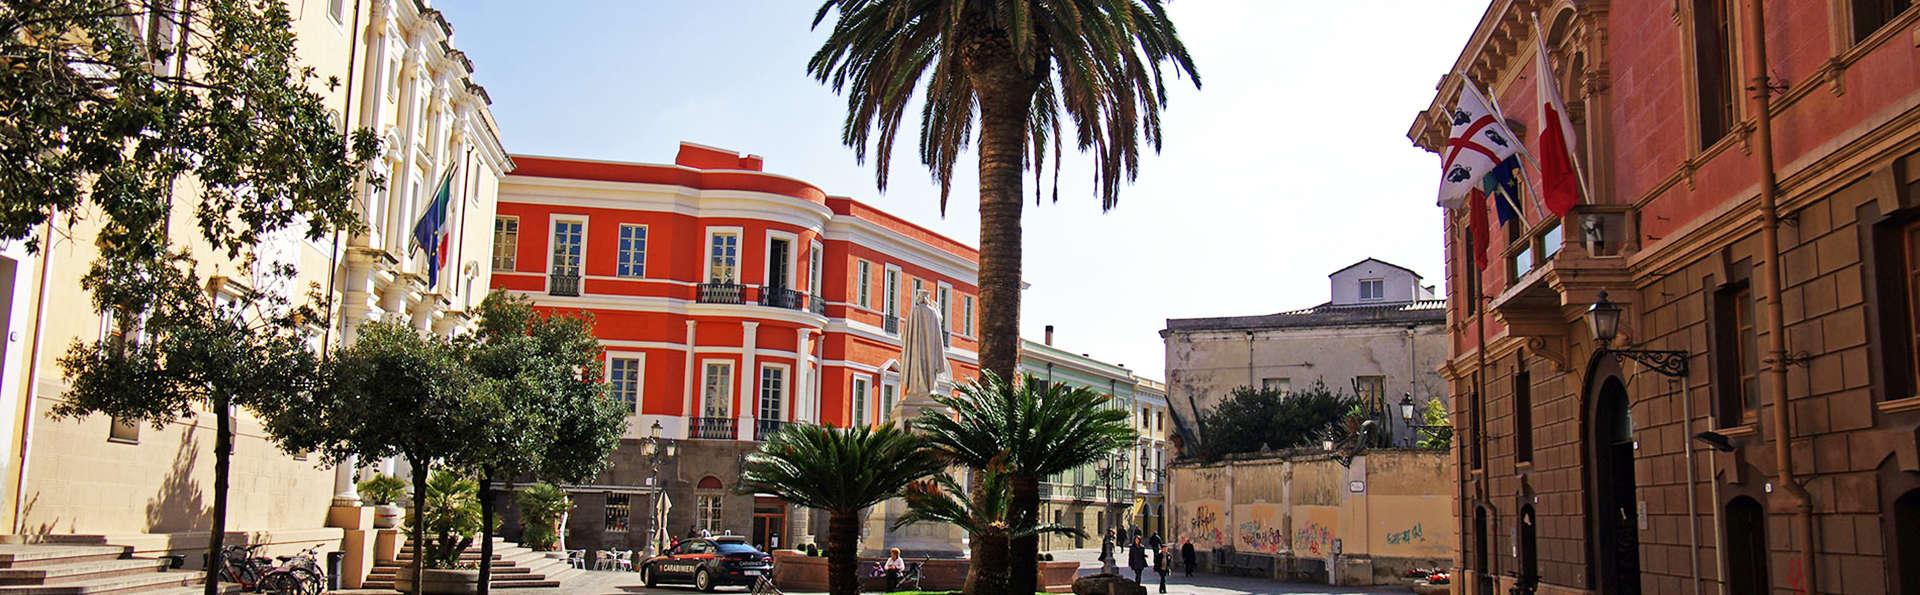 Mariano IV Palace Hotel - edit_LORSITANO.jpg